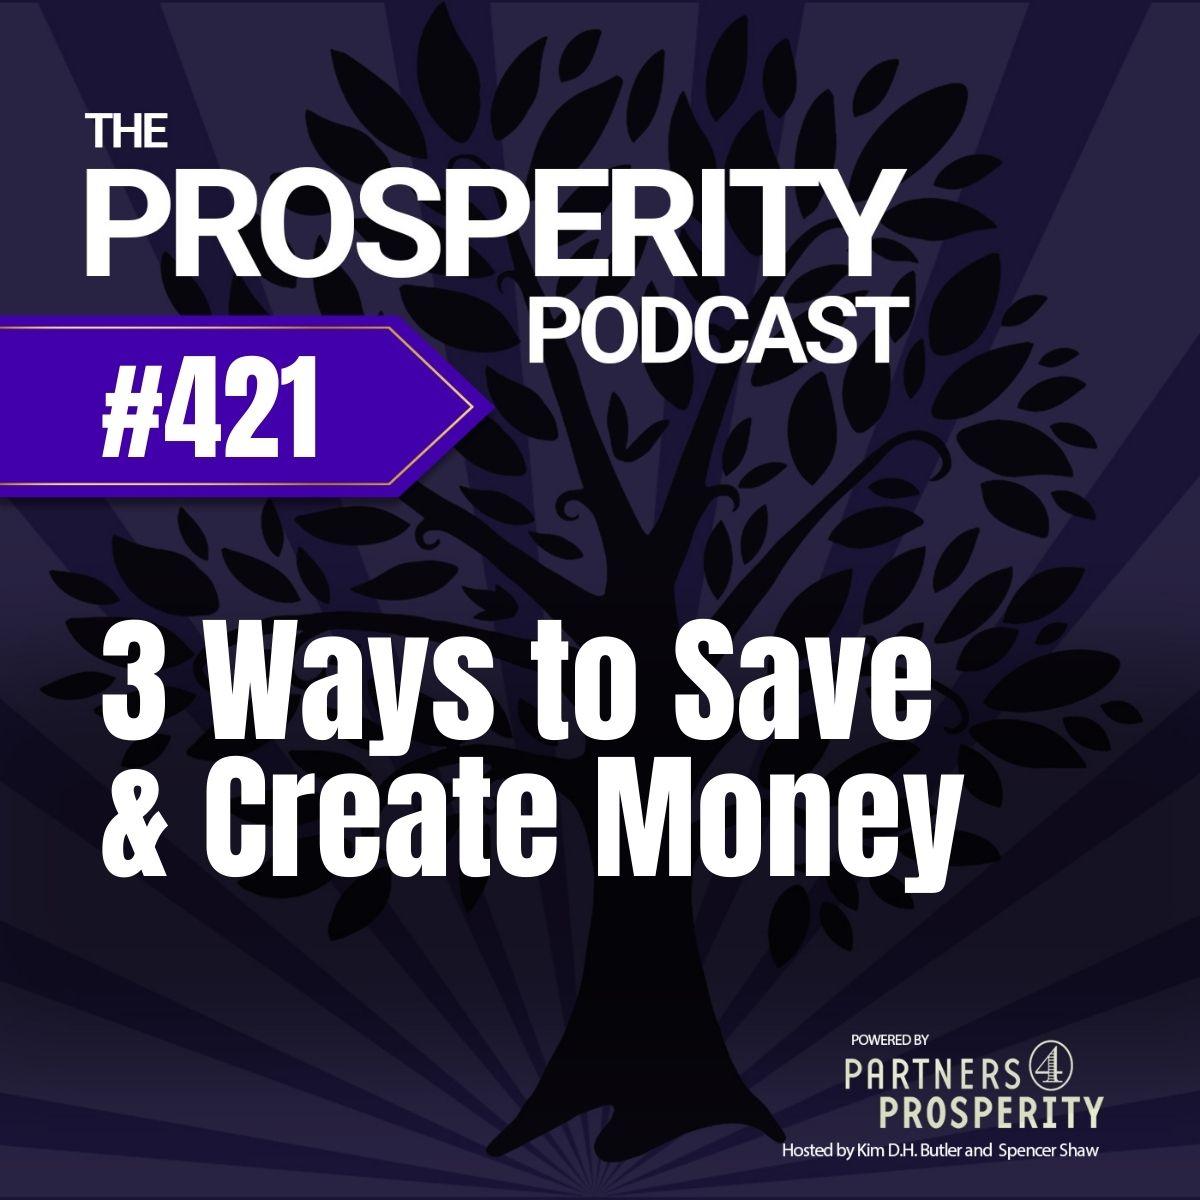 3 Ways to Save & Create Money